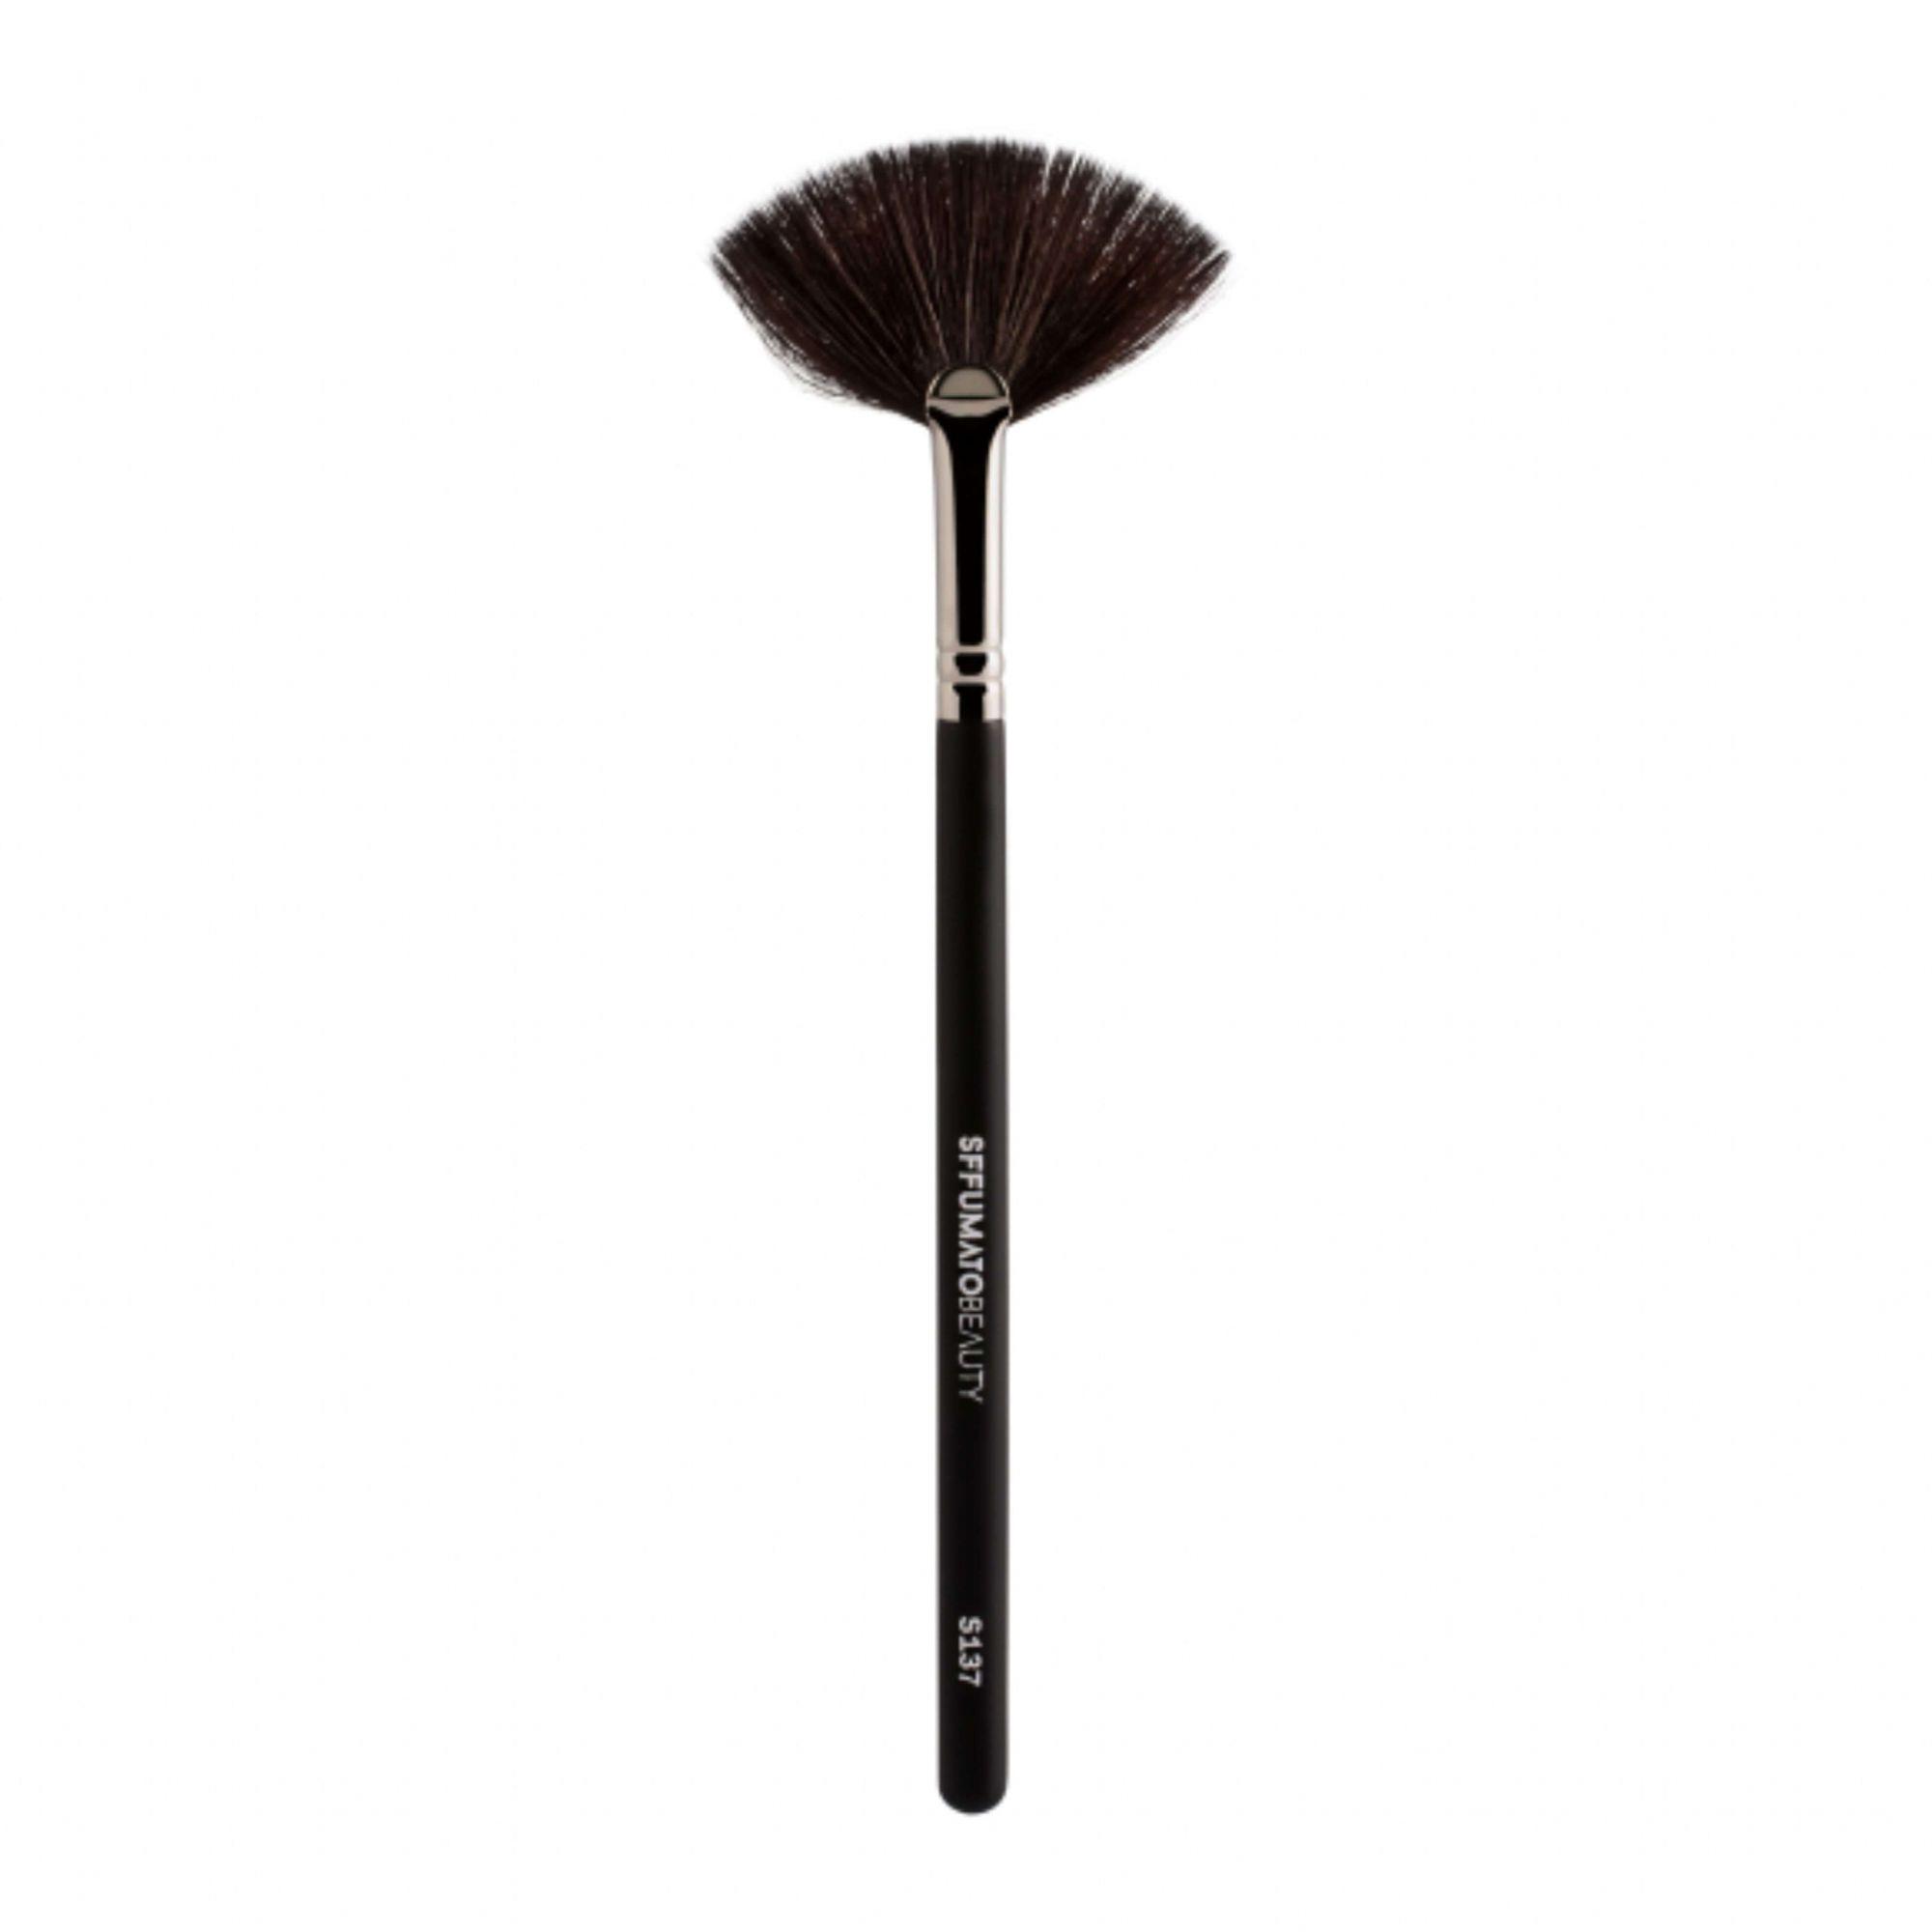 Pincel Leque S137 Sffumato Beauty